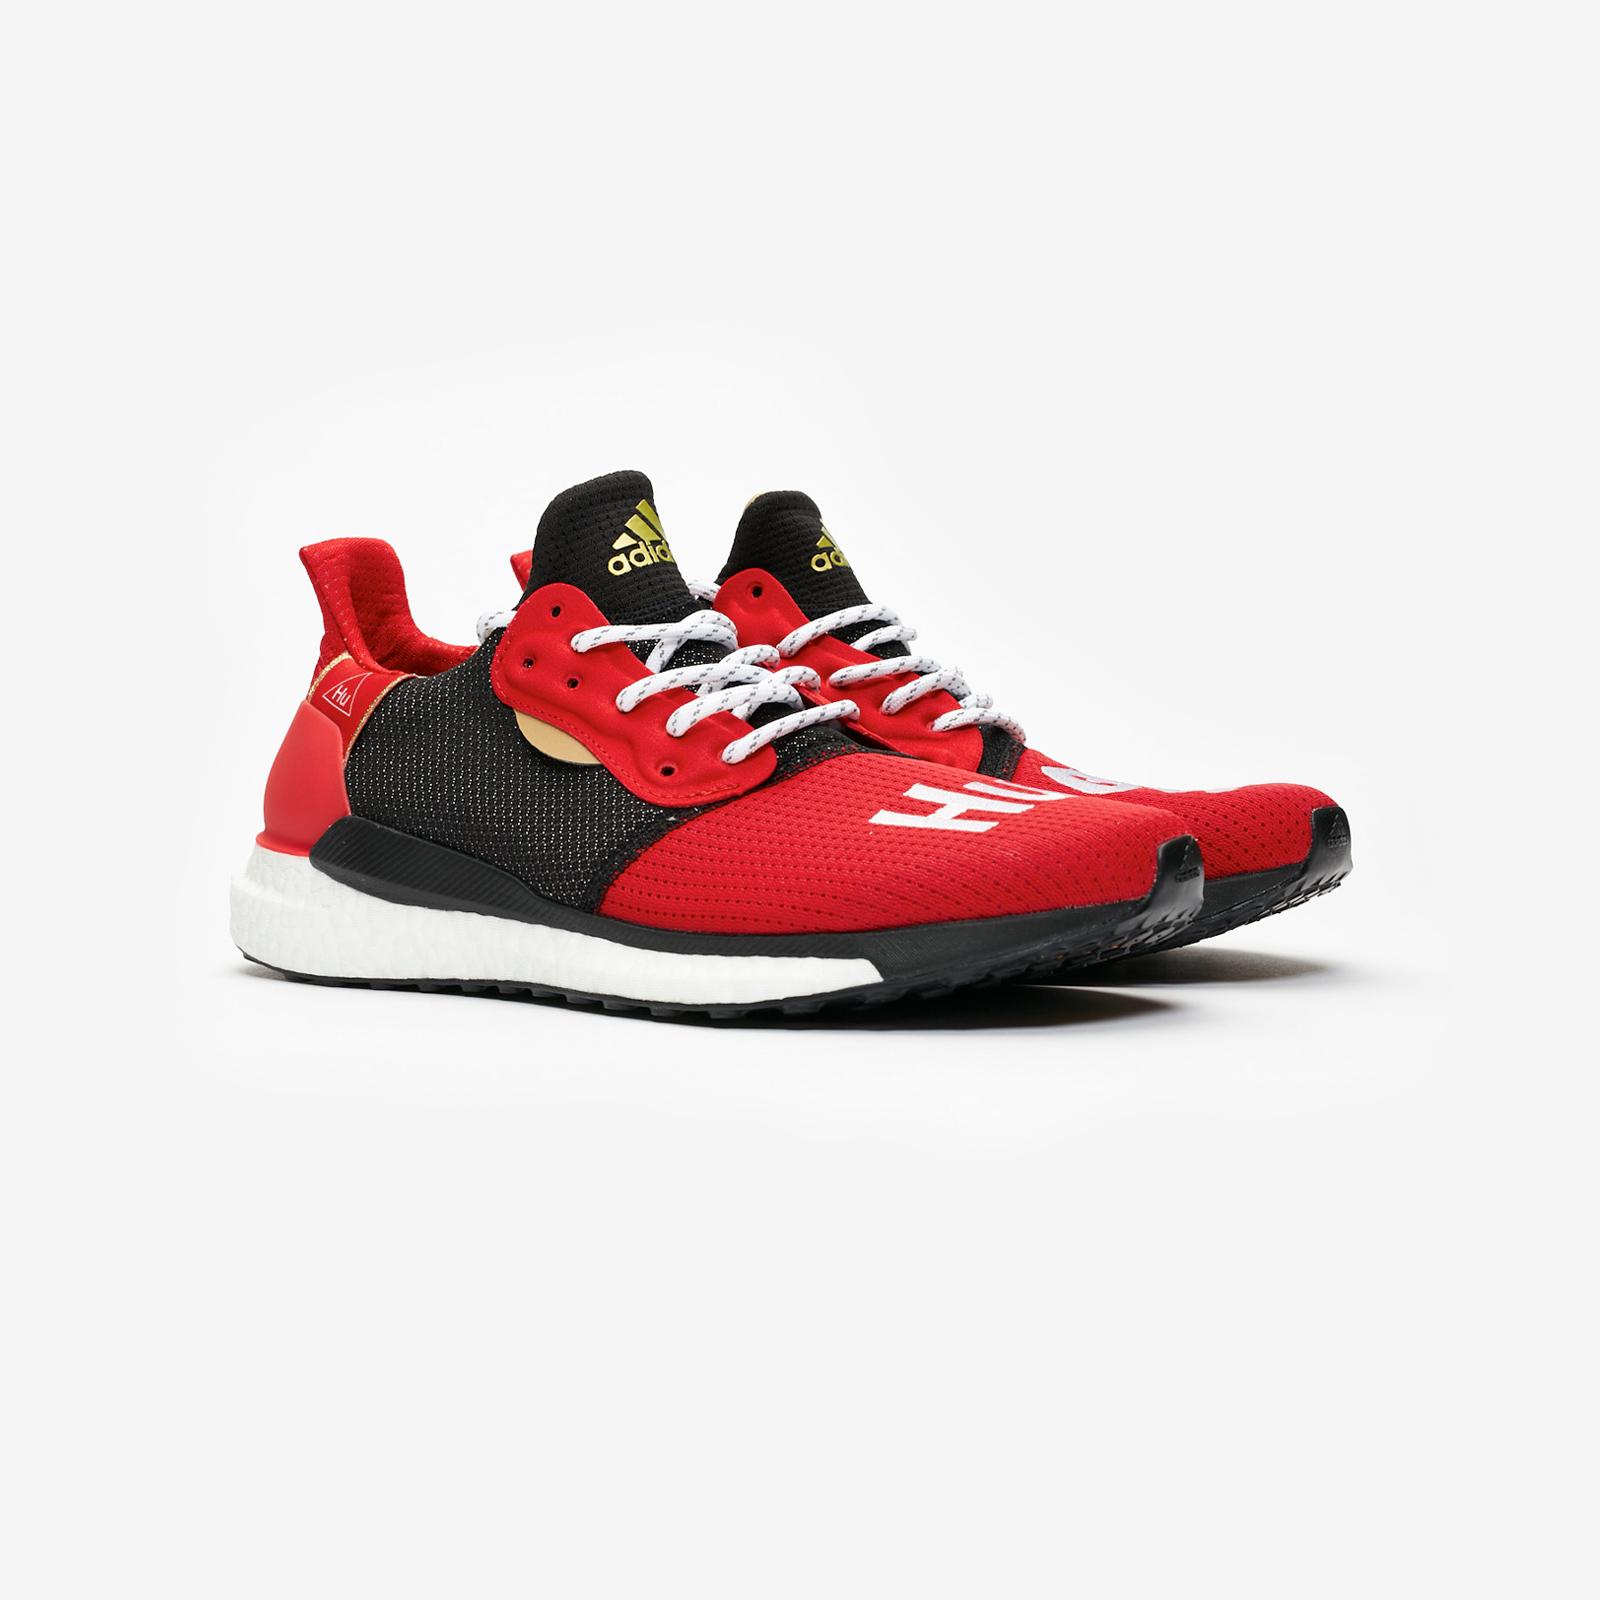 cdaedbb80 adidas PW X CNY Solar HU - Ee8701 - Sneakersnstuff